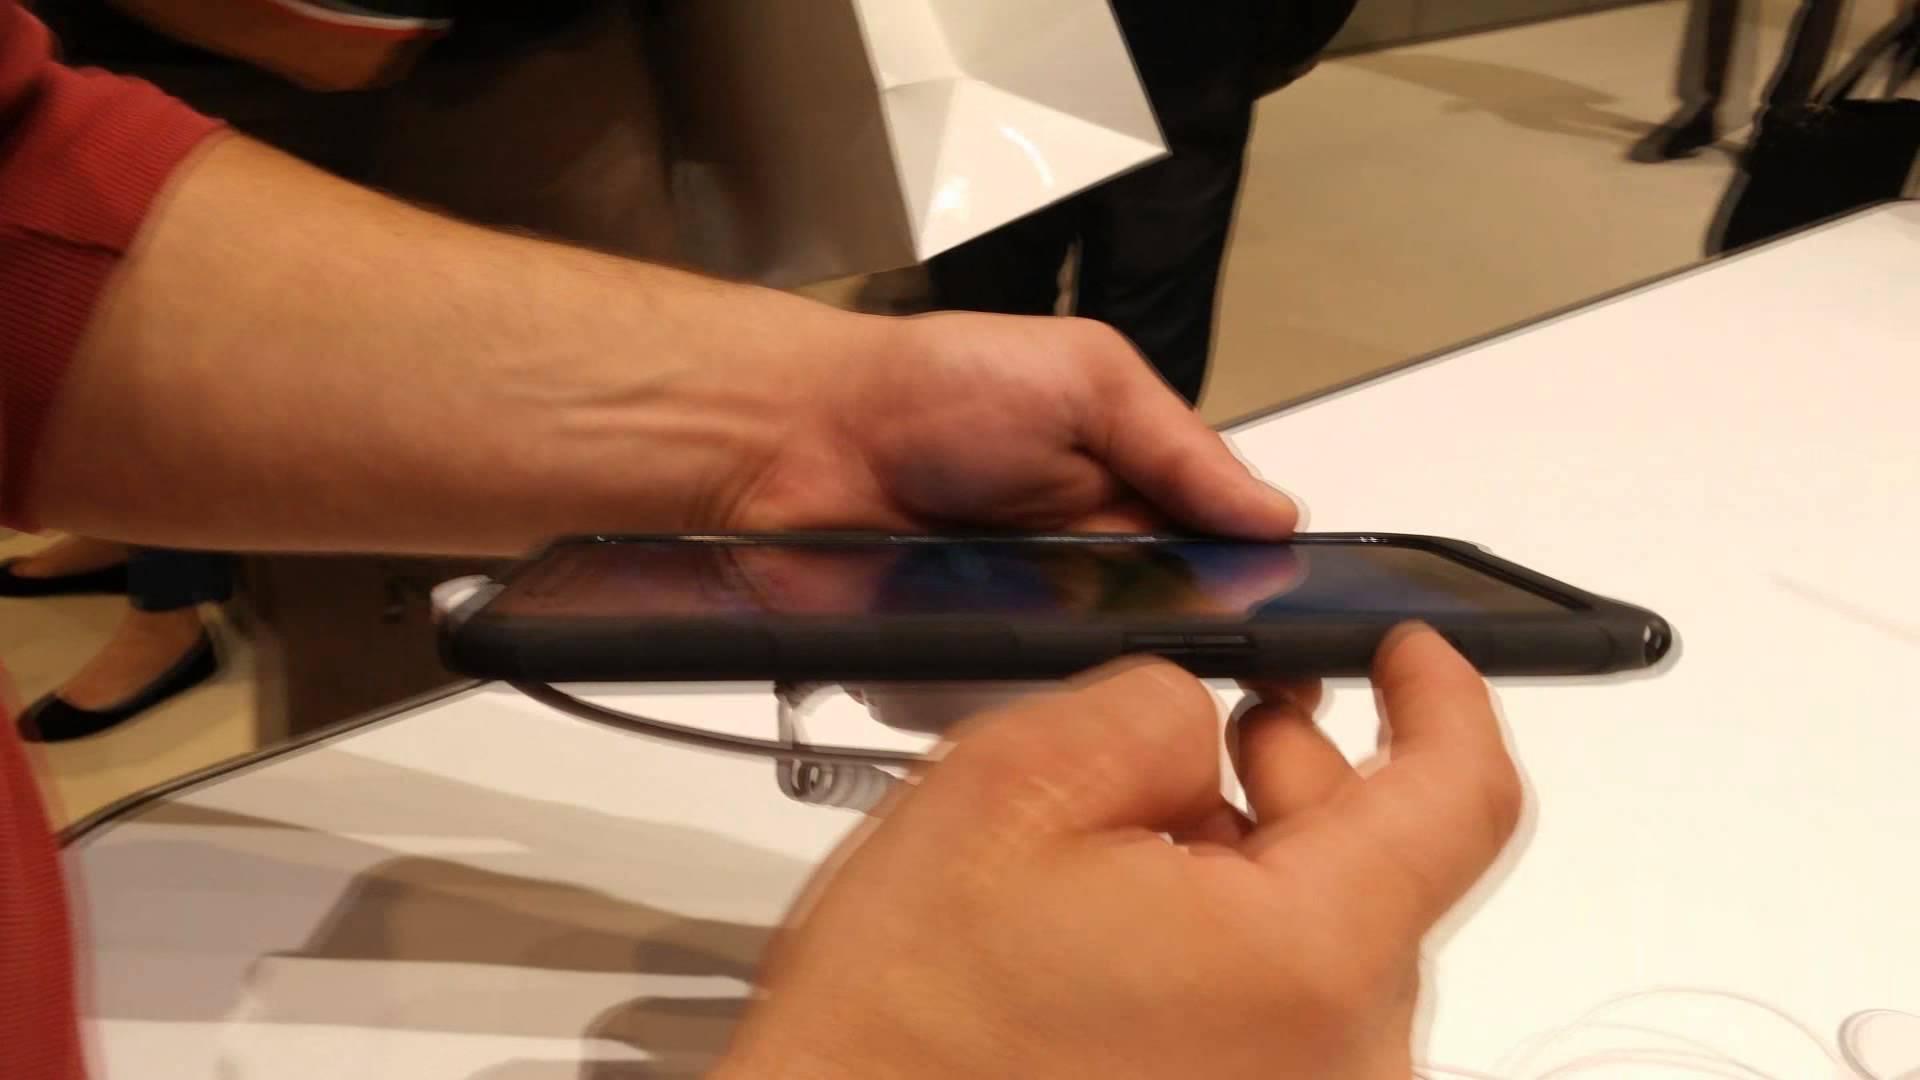 [IFA 2014] Tablette Samsung Galaxy Tab Active pour plus de robustesse